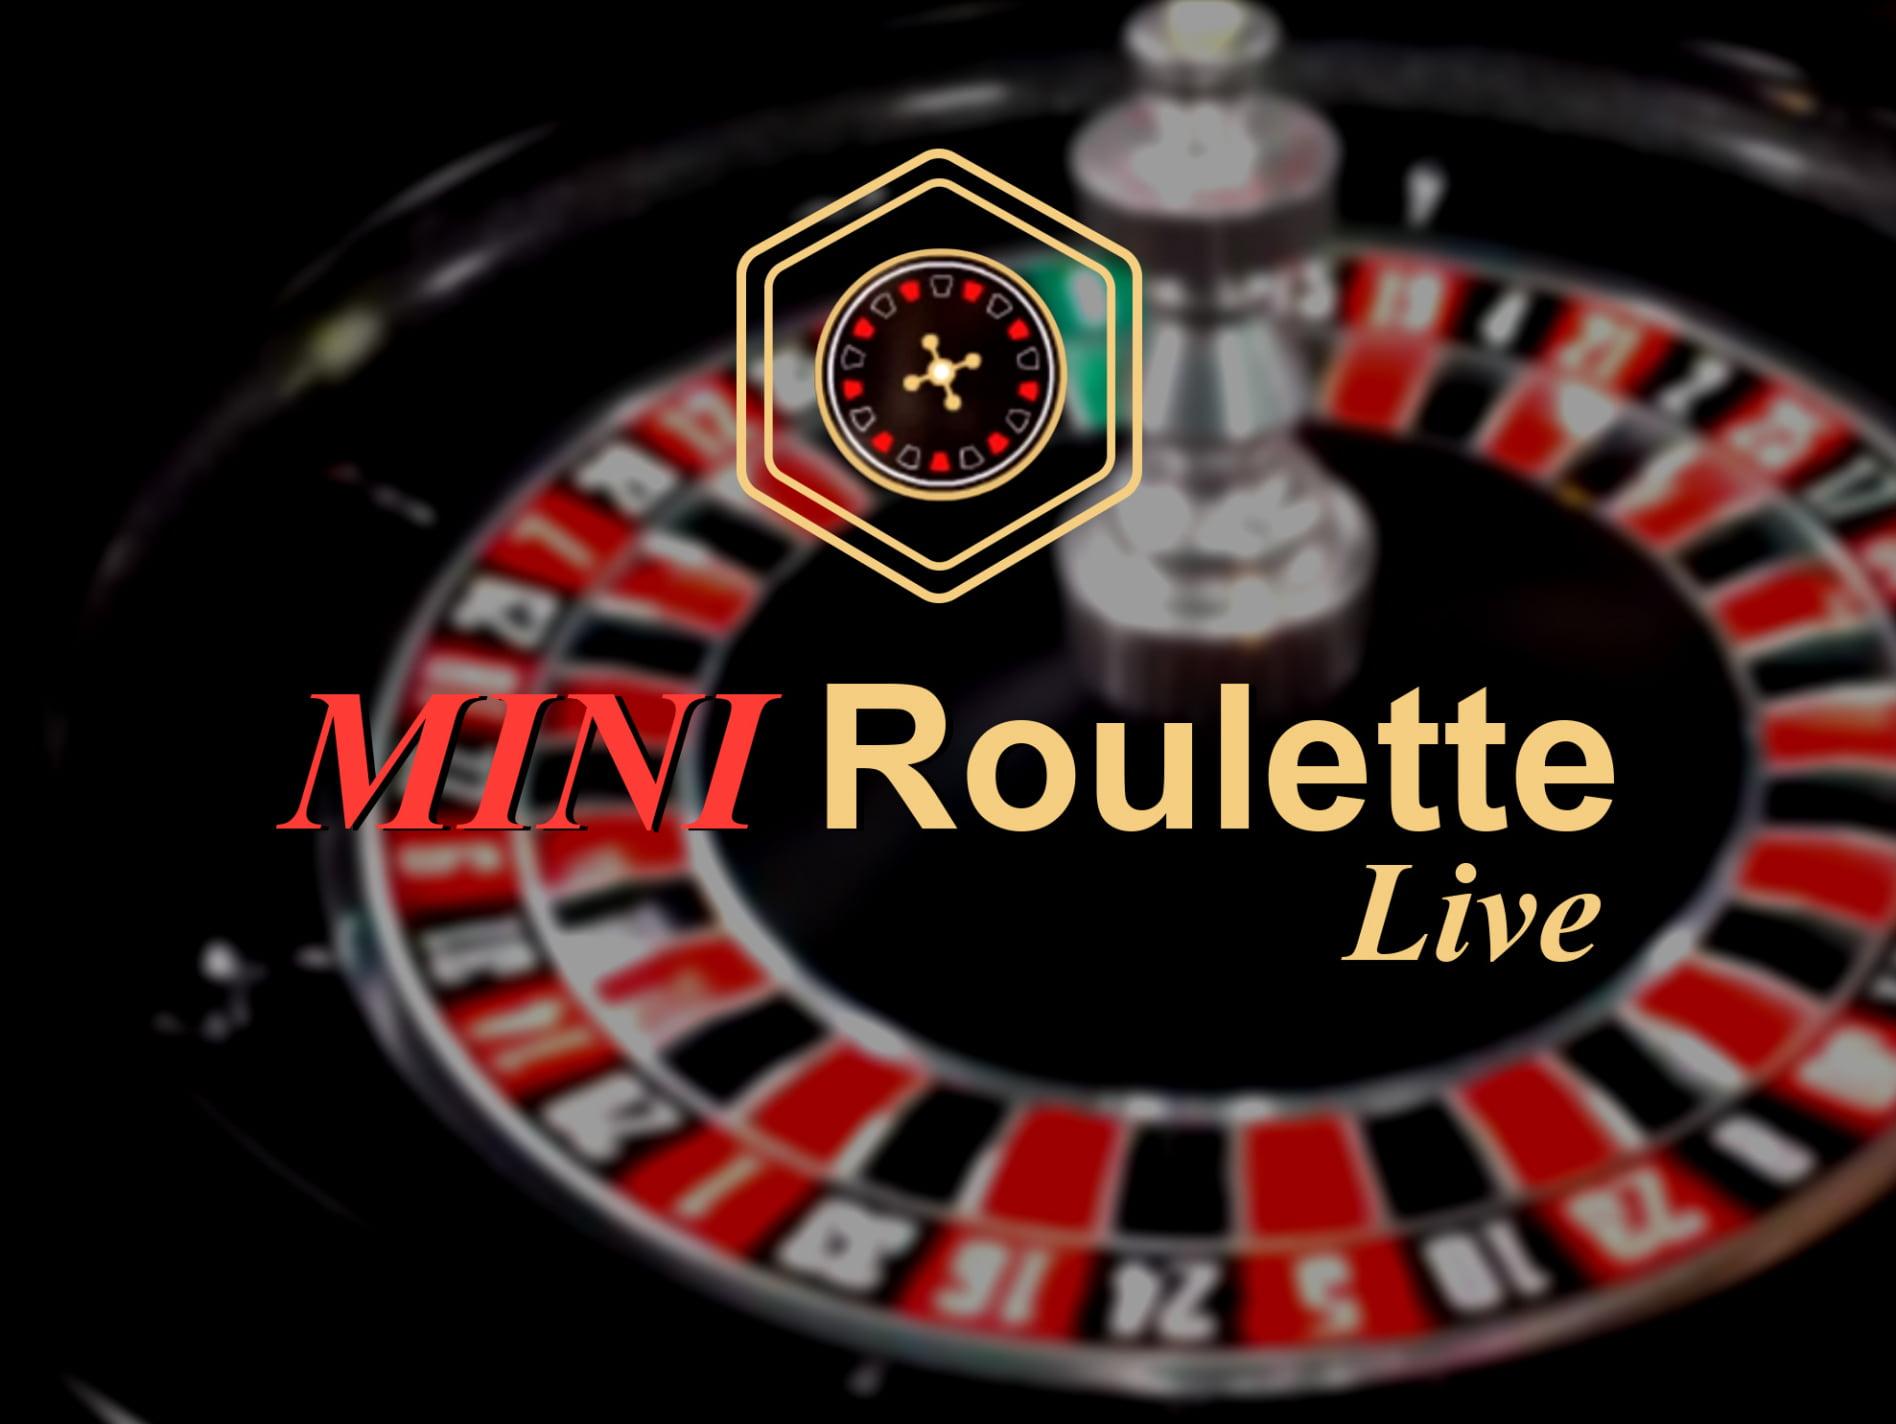 Jugar ruleta francesa gratis como loteria La Serena-354280